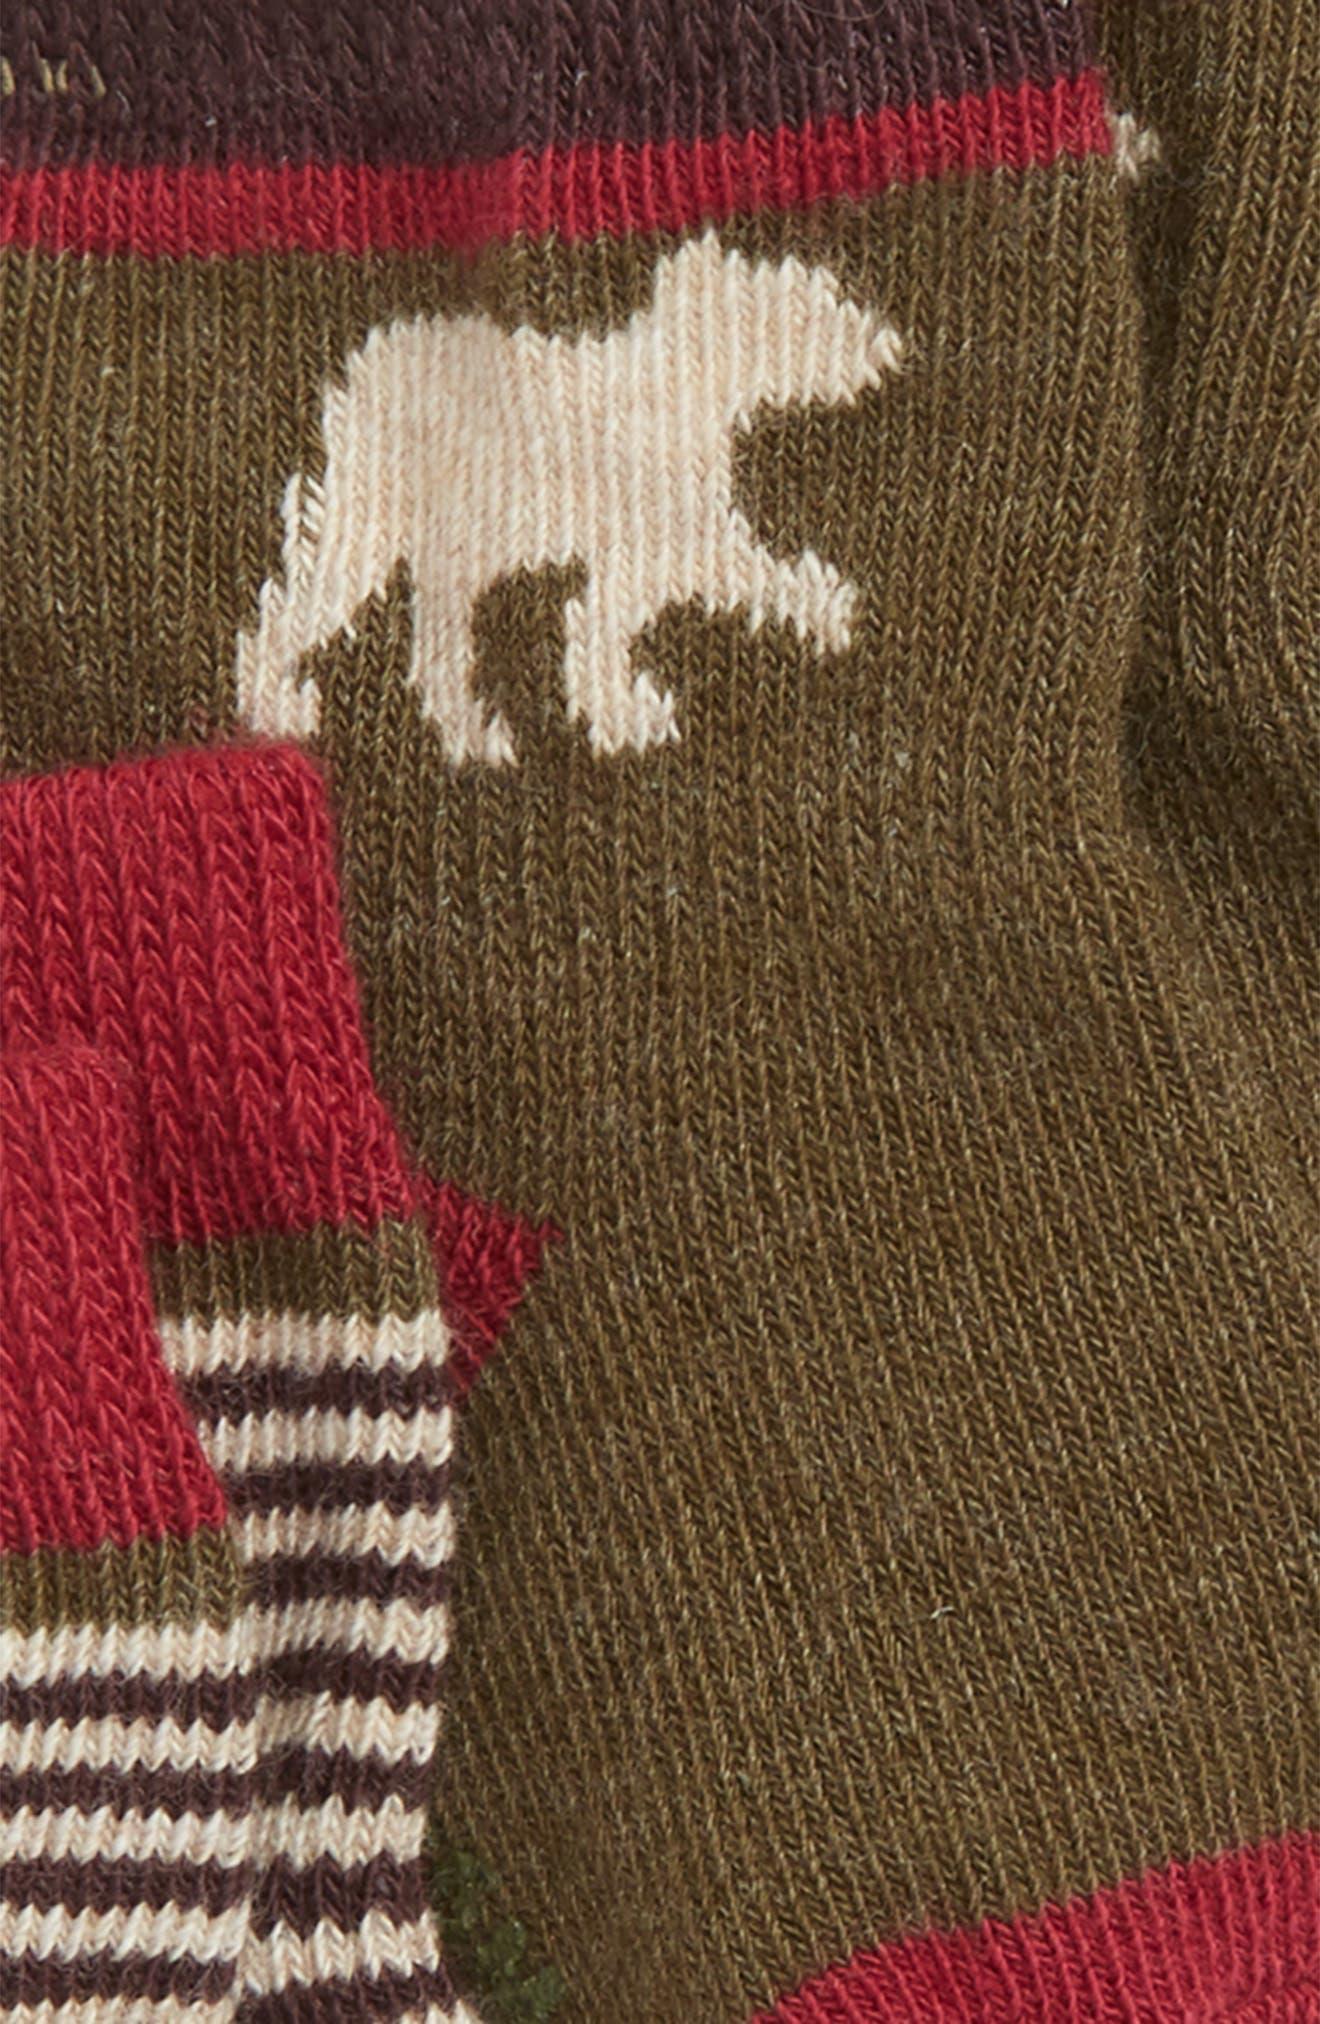 Forest Dweller 3-Pack Socks,                             Alternate thumbnail 2, color,                             RED/ BROWN